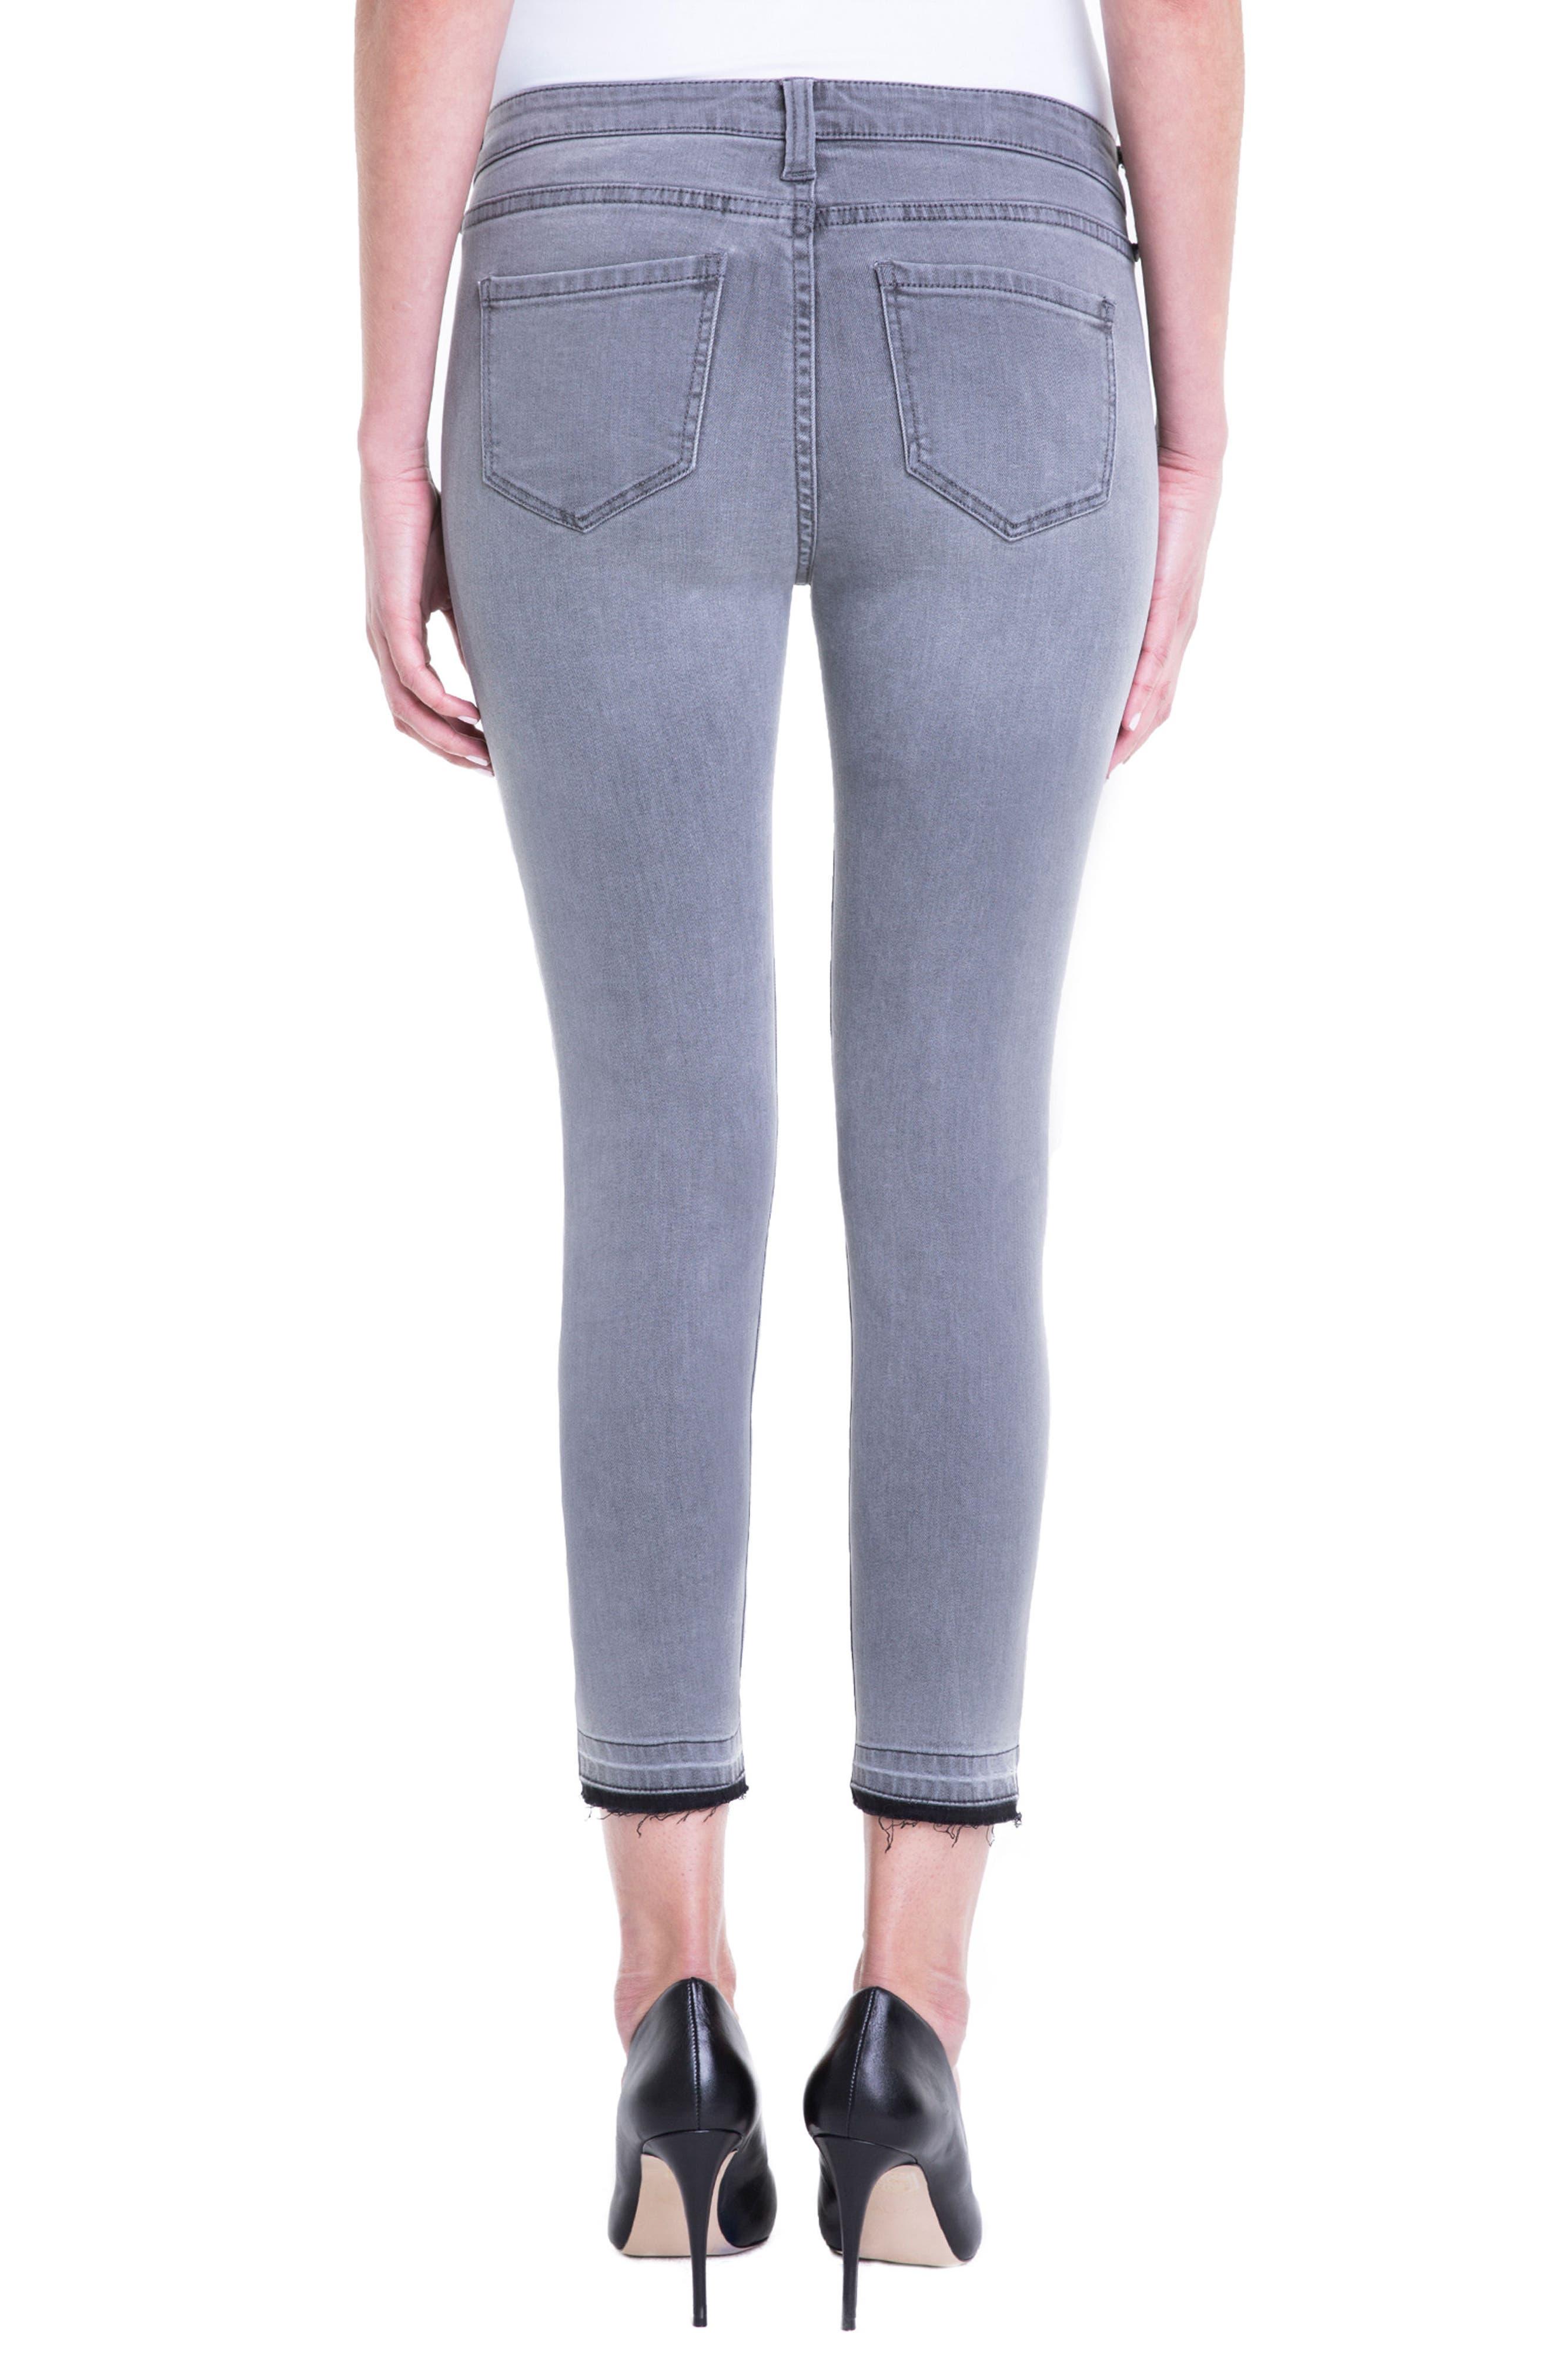 Avery Release Hem Crop Jeans,                             Alternate thumbnail 3, color,                             Aluminum Wash